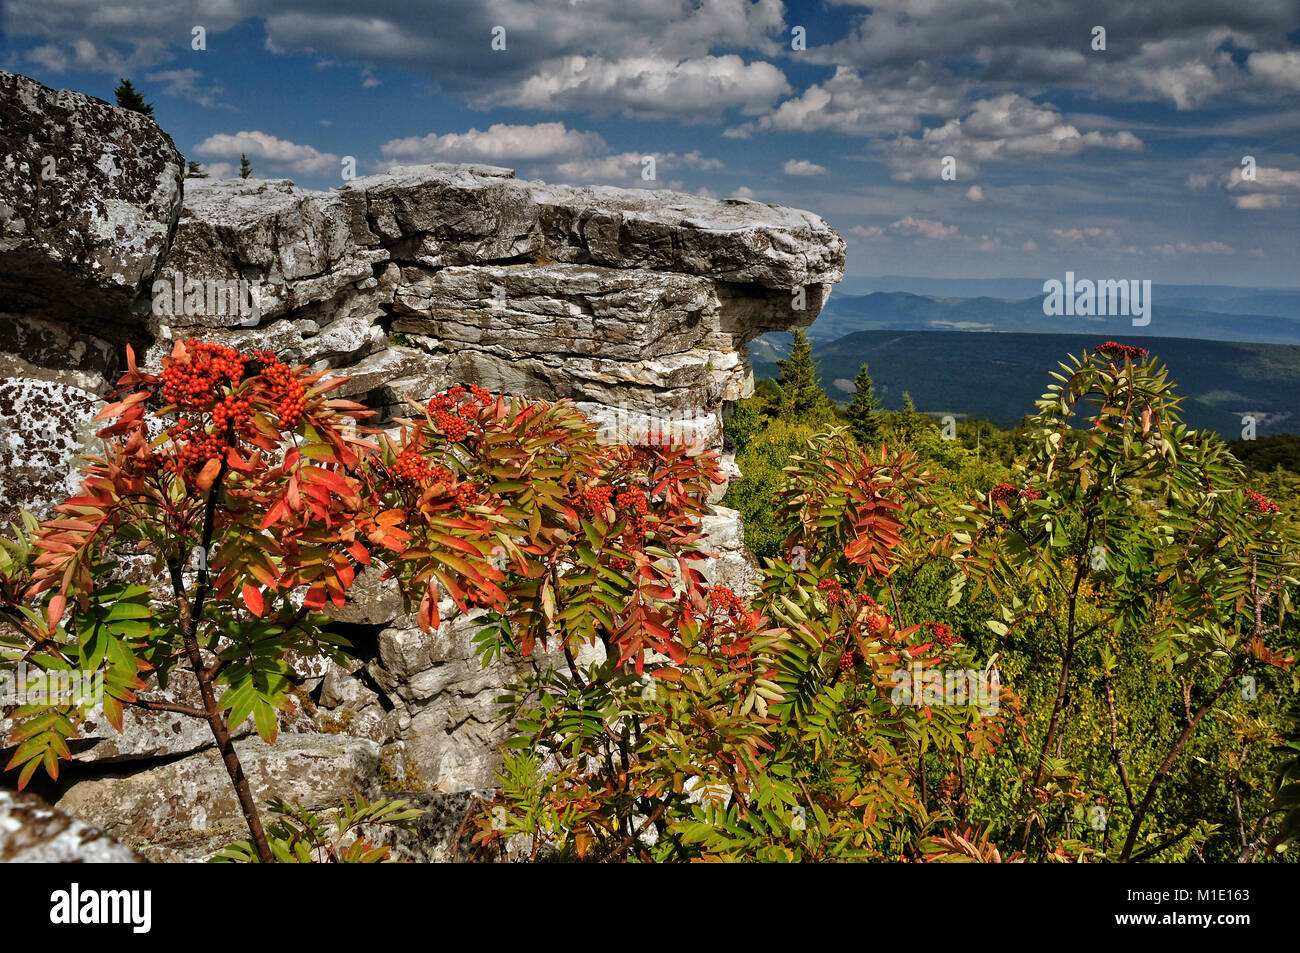 Bear Rocks Dolly Sods West Virginia - Stock Image